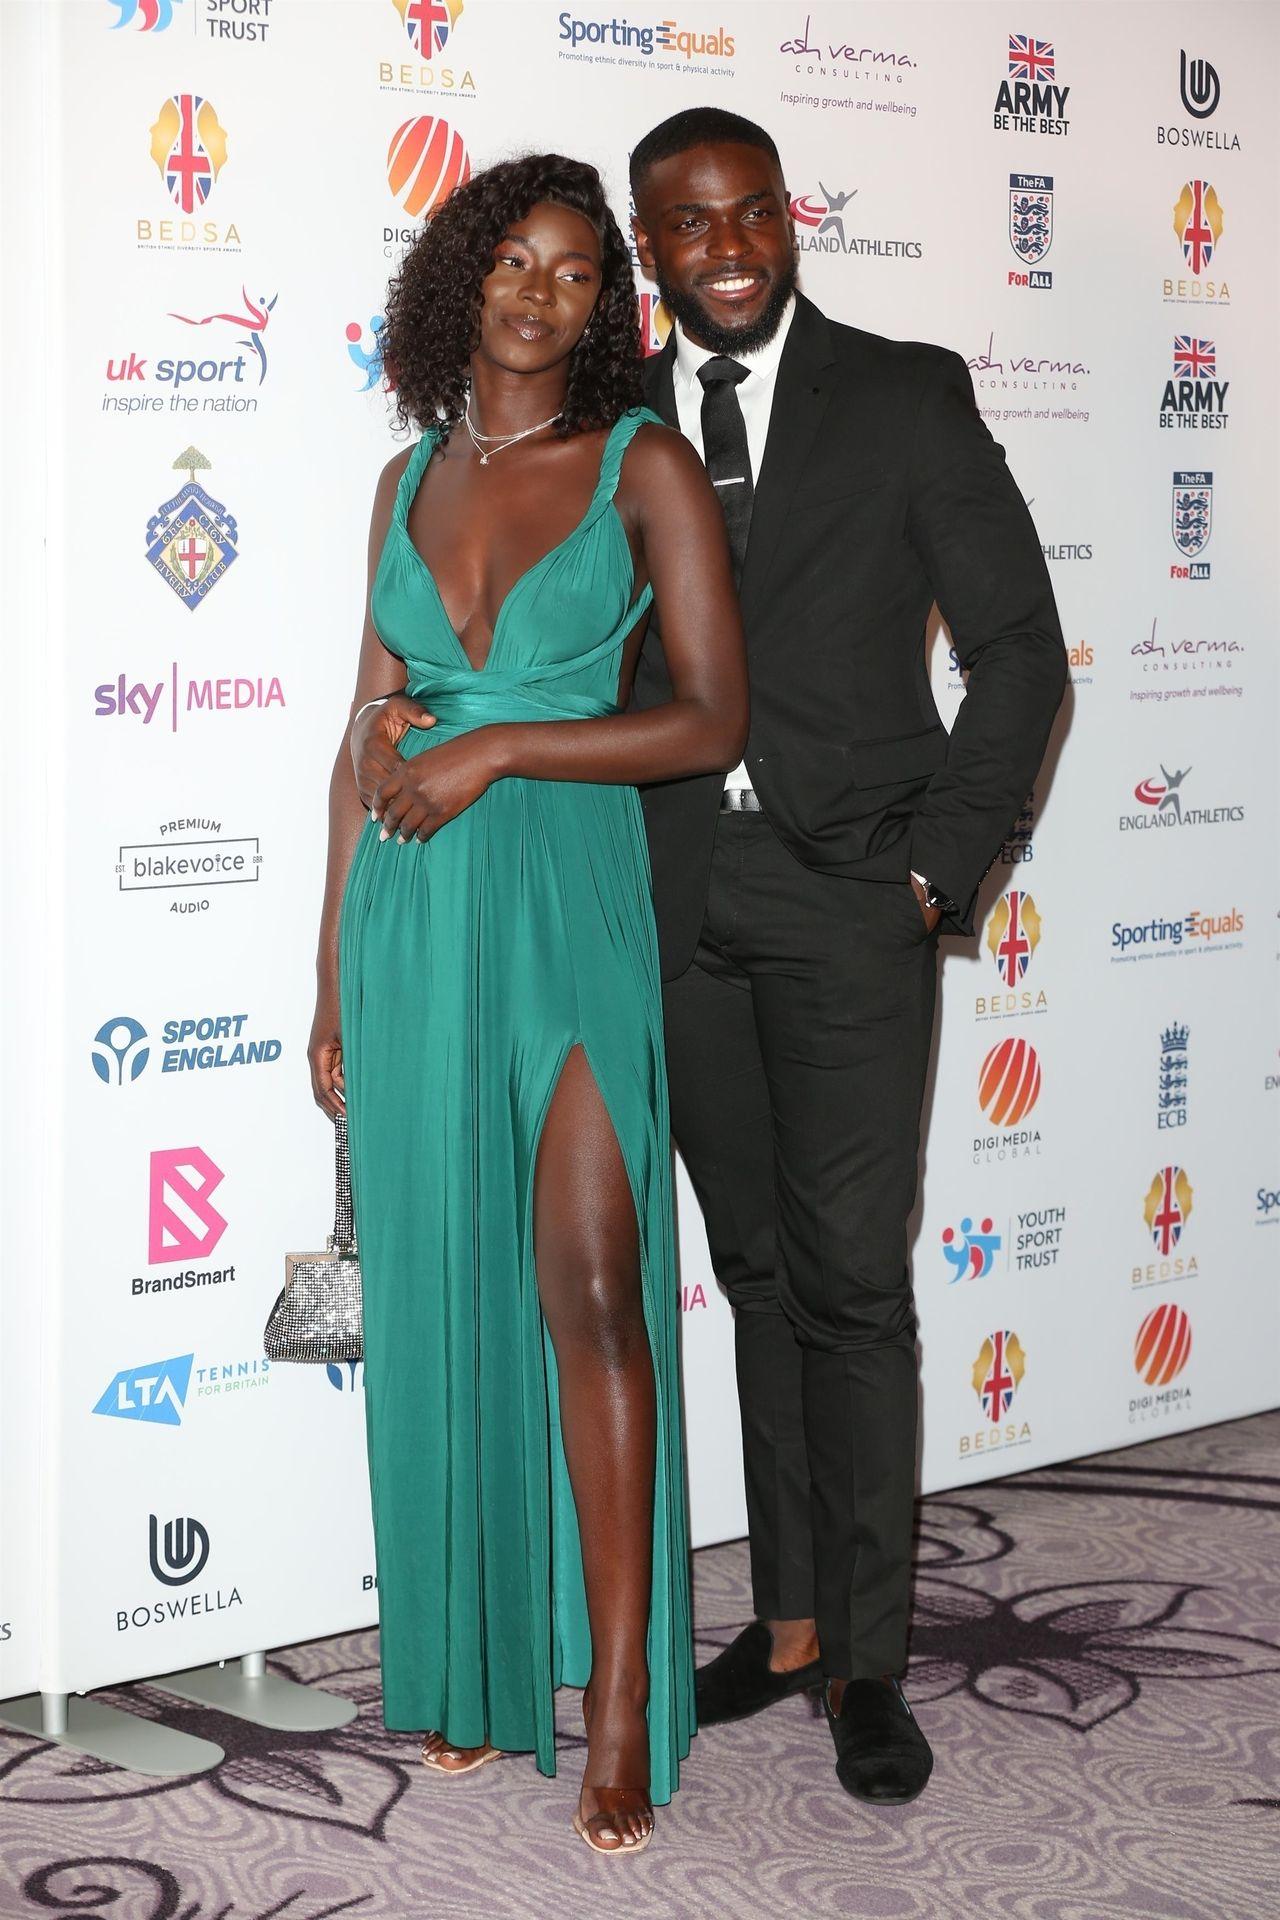 Mike Boateng & Priscilla Anyabu Are Seen At British Ethnic Diversity Sports Awards 0043